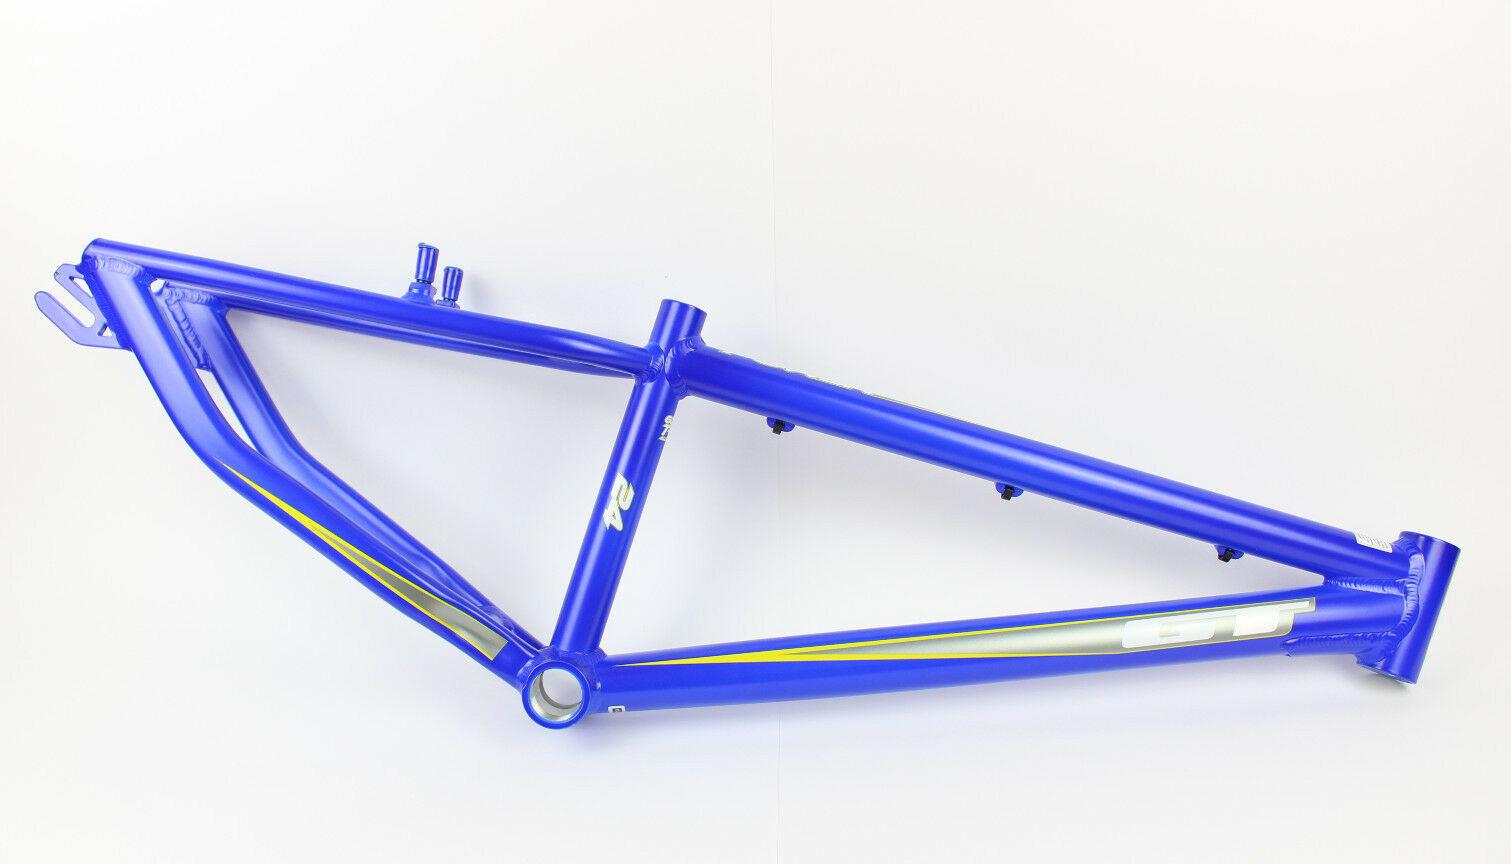 Gt bicycles power series 24 pulgadas marco    nuevo    BMX Race frame BSA azul 24